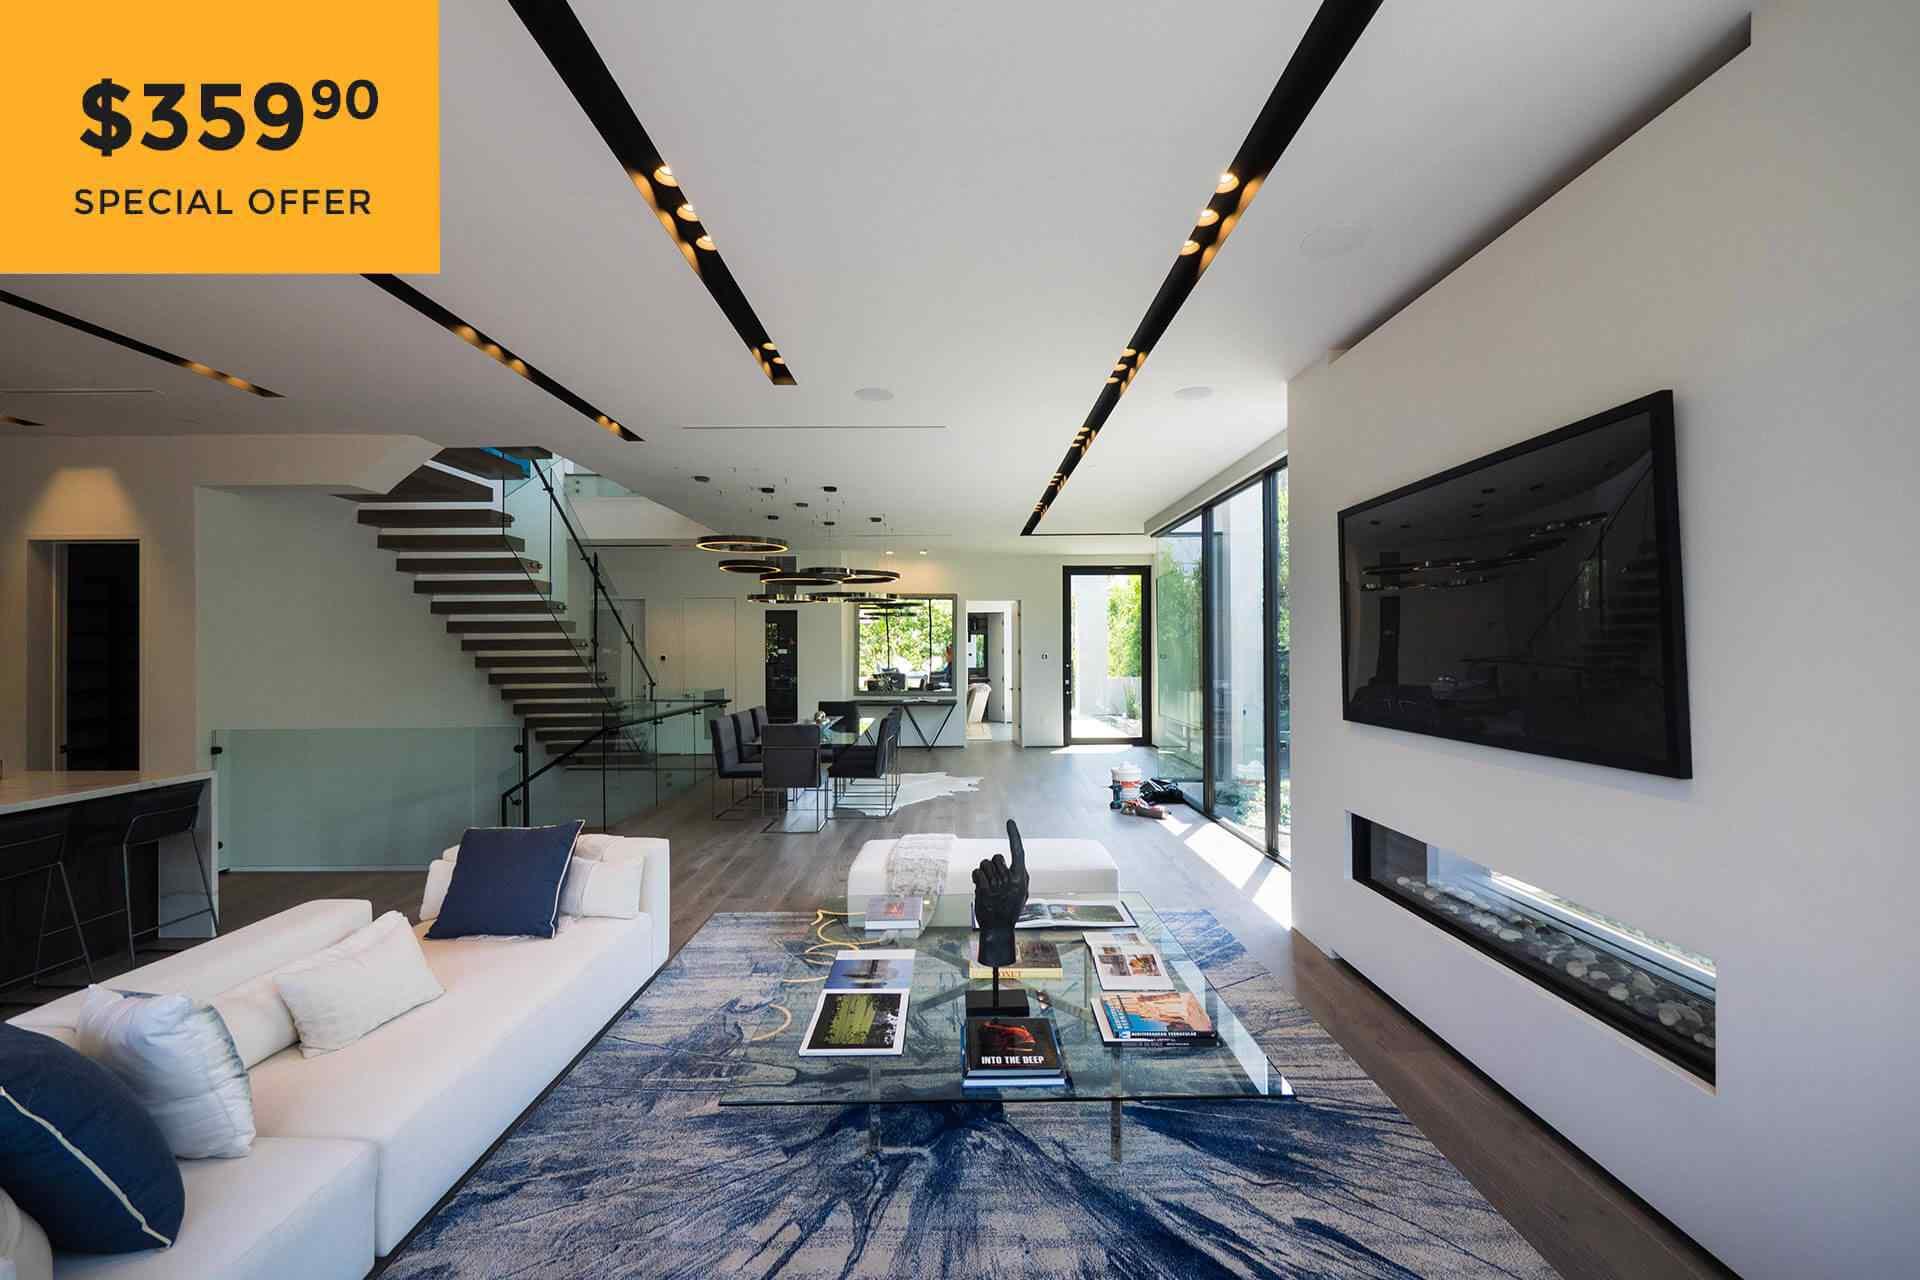 Cool Living 5,000 BTU 9.7 EER 115V Window Mount Room